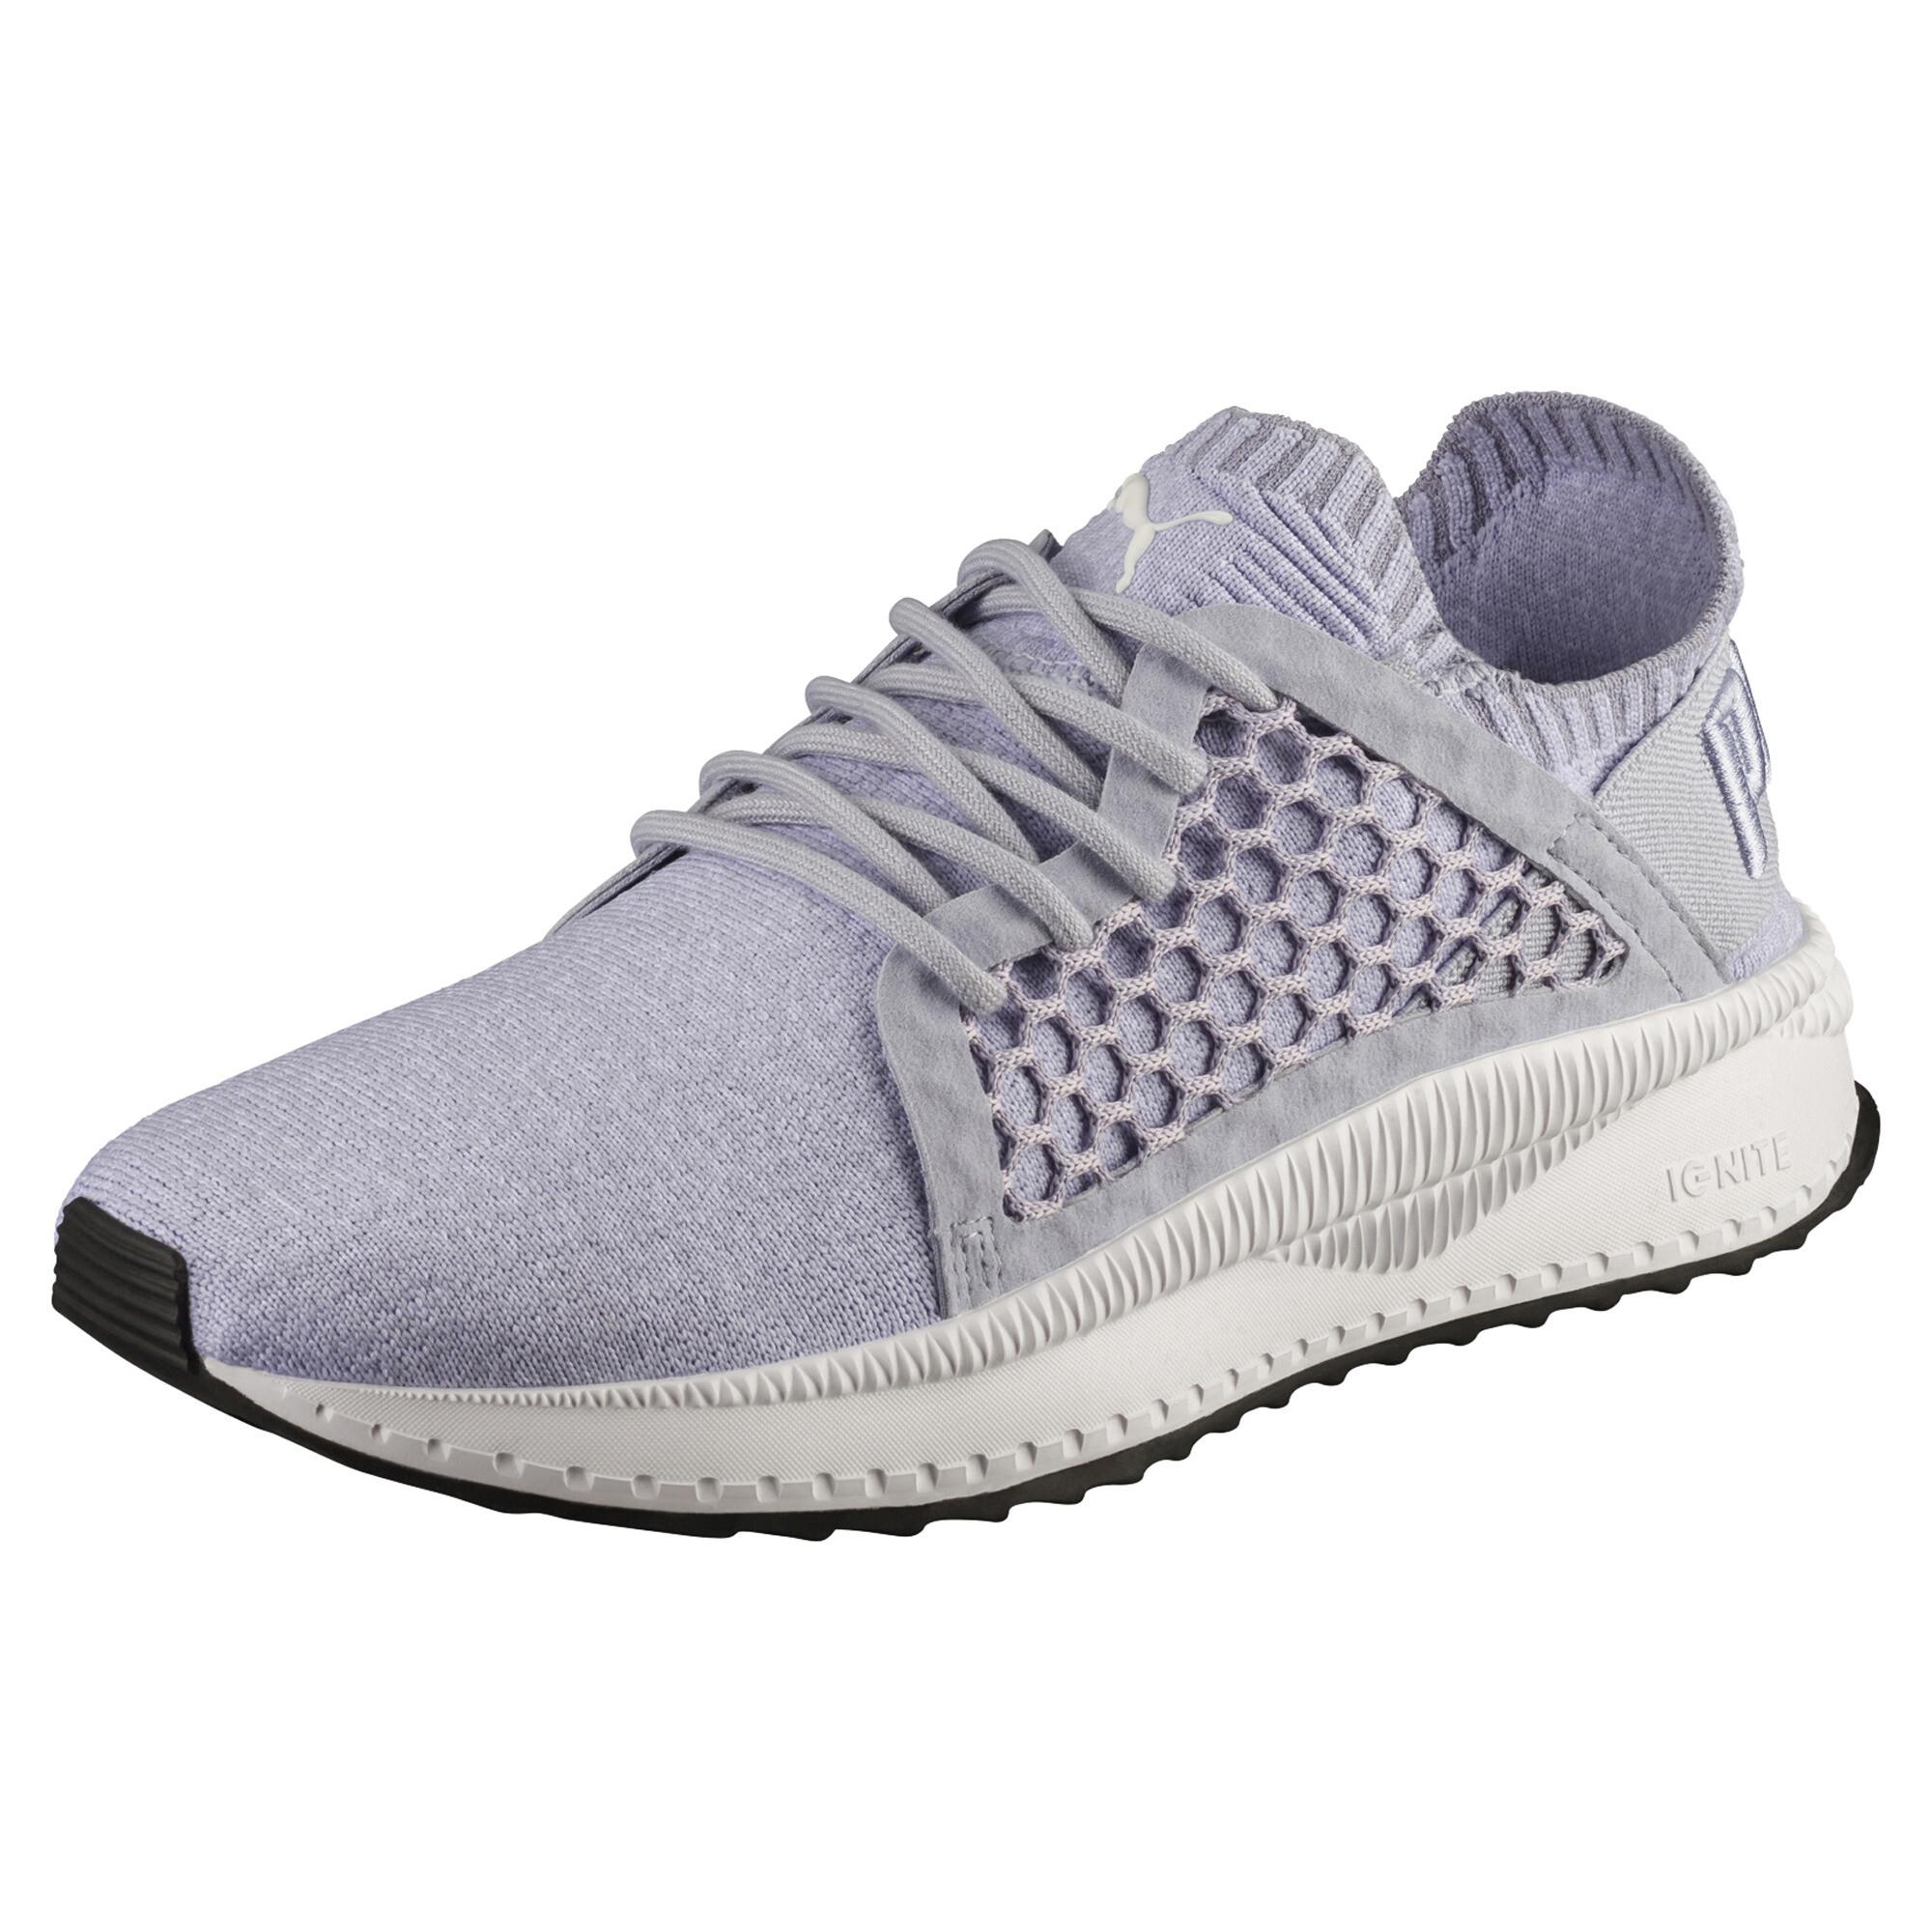 PUMA-TSUGI-NETFIT-evoKNIT-Sneaker-Frauen-Schuhe-Neu Indexbild 4